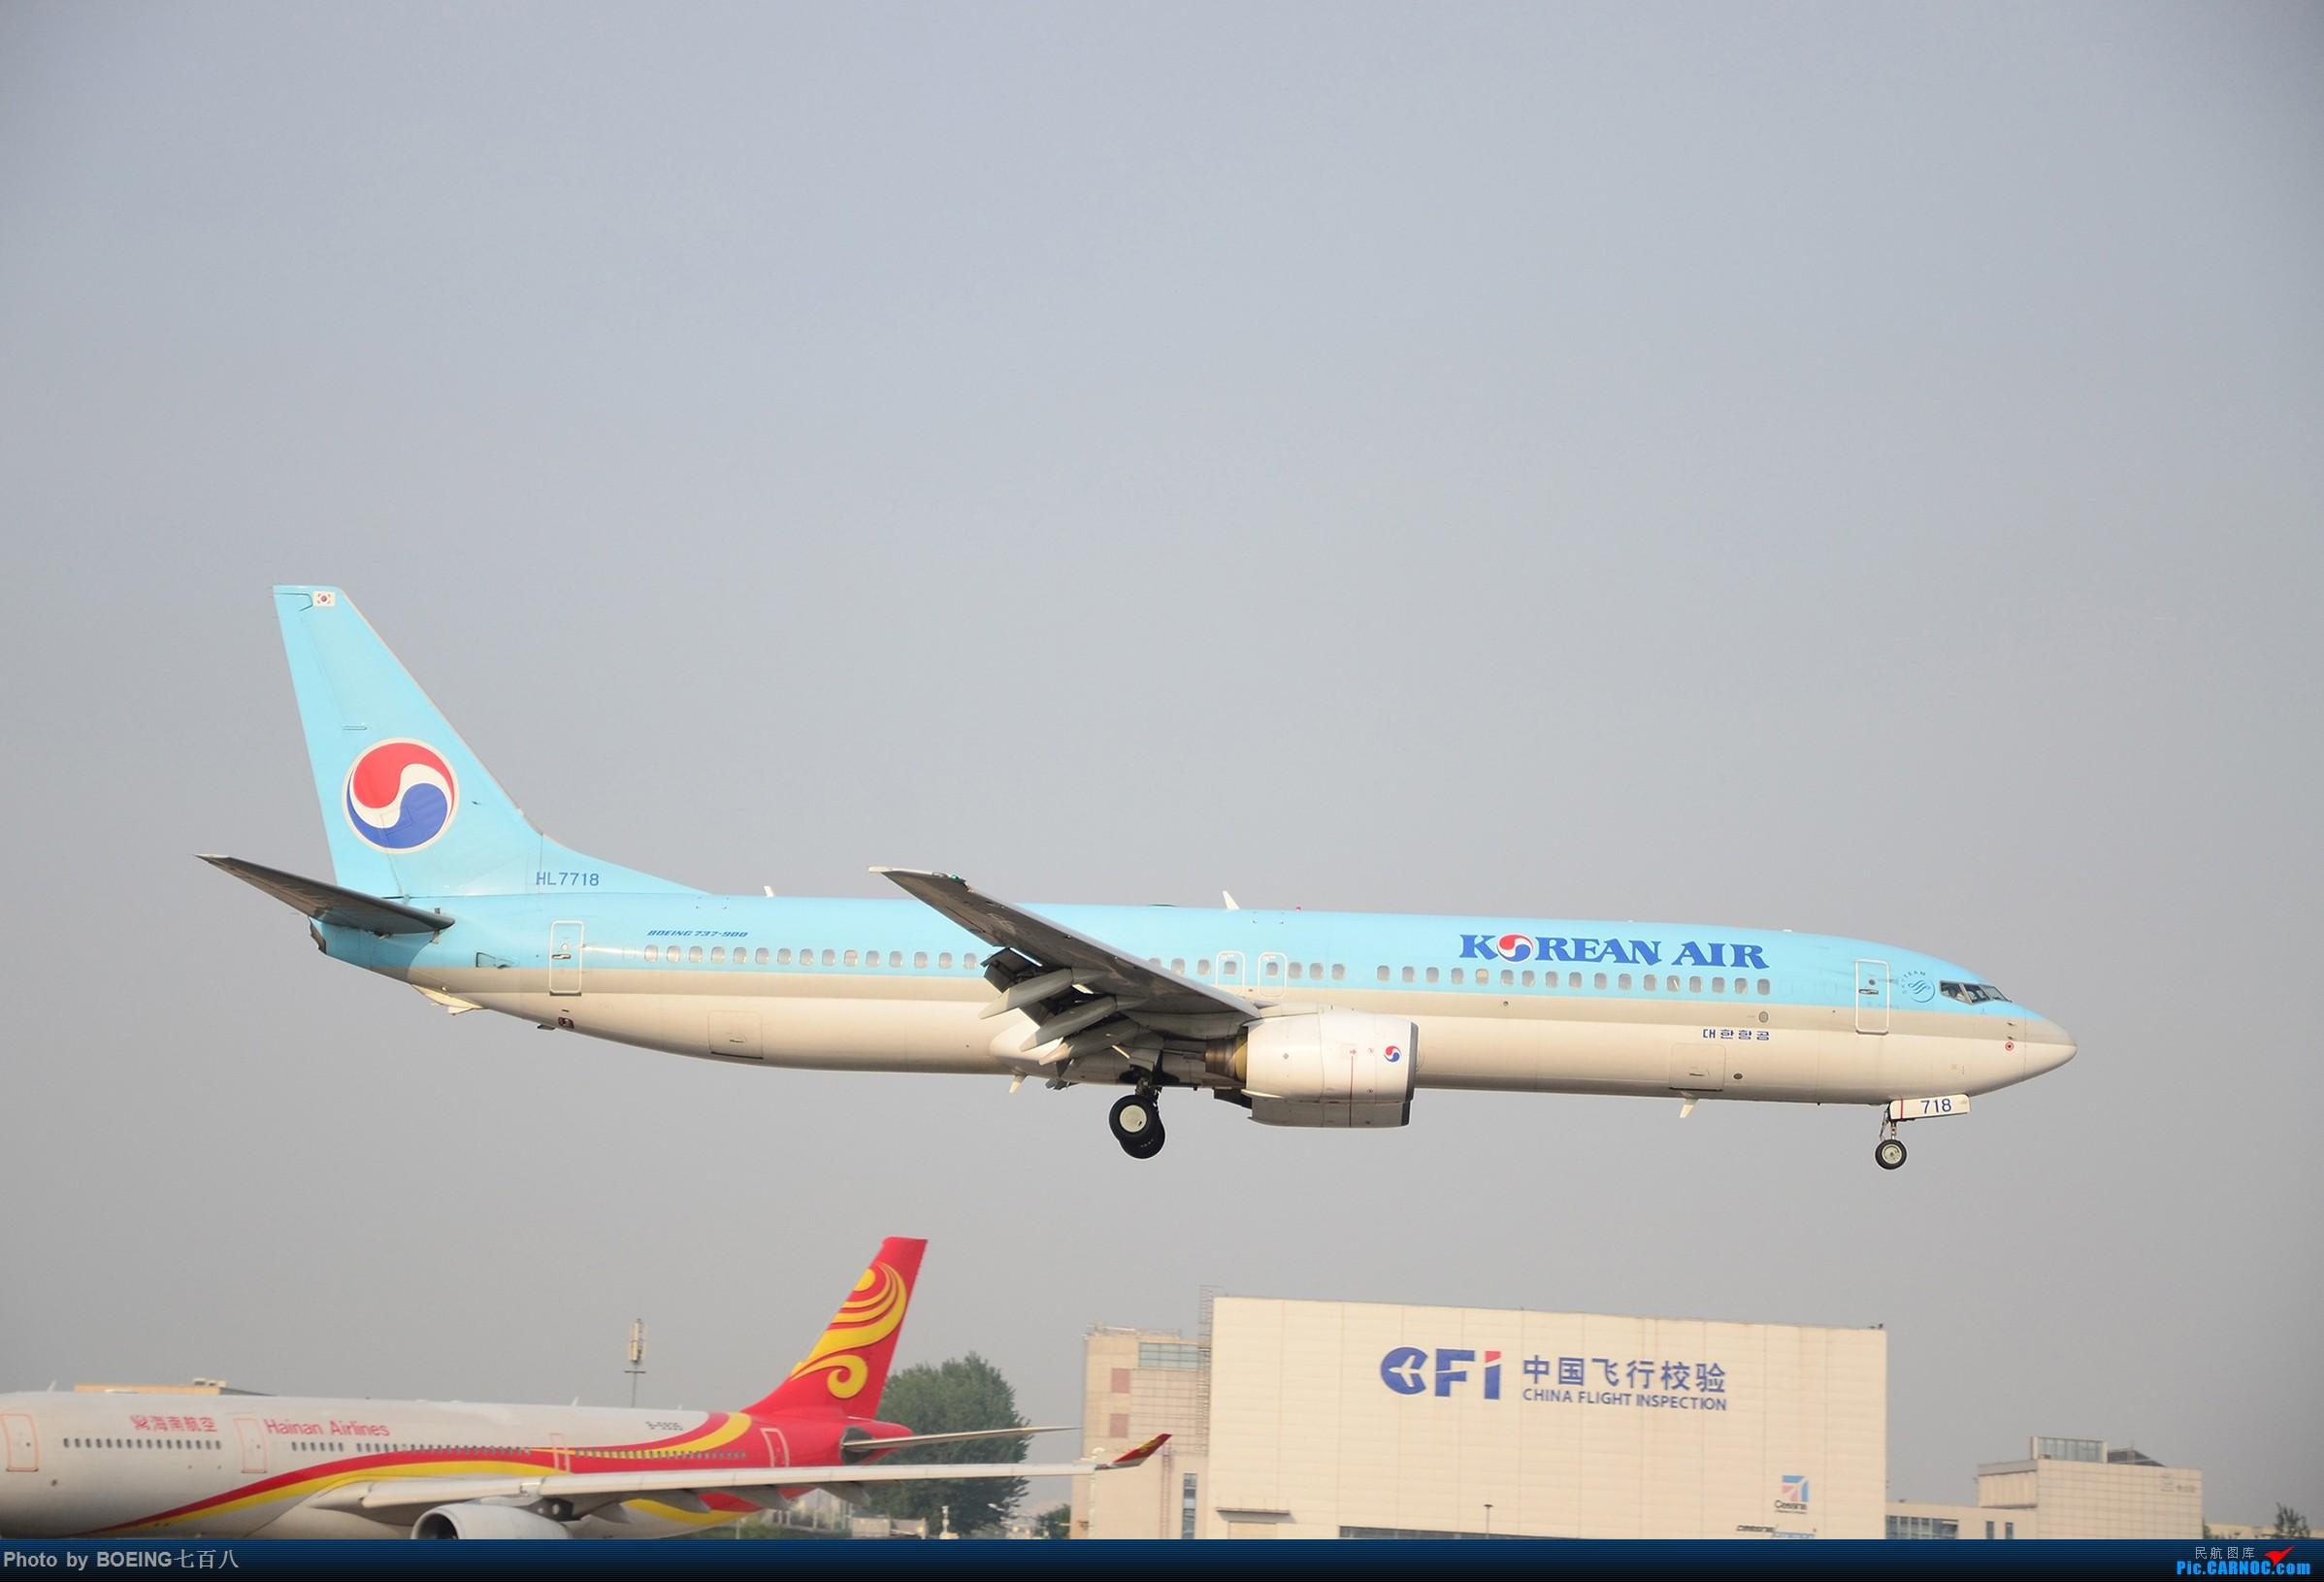 Re:[原创]海航家的黄焖熊猫和清蒸熊猫等好货 BOEING 737-900 HL7718 中国北京首都国际机场